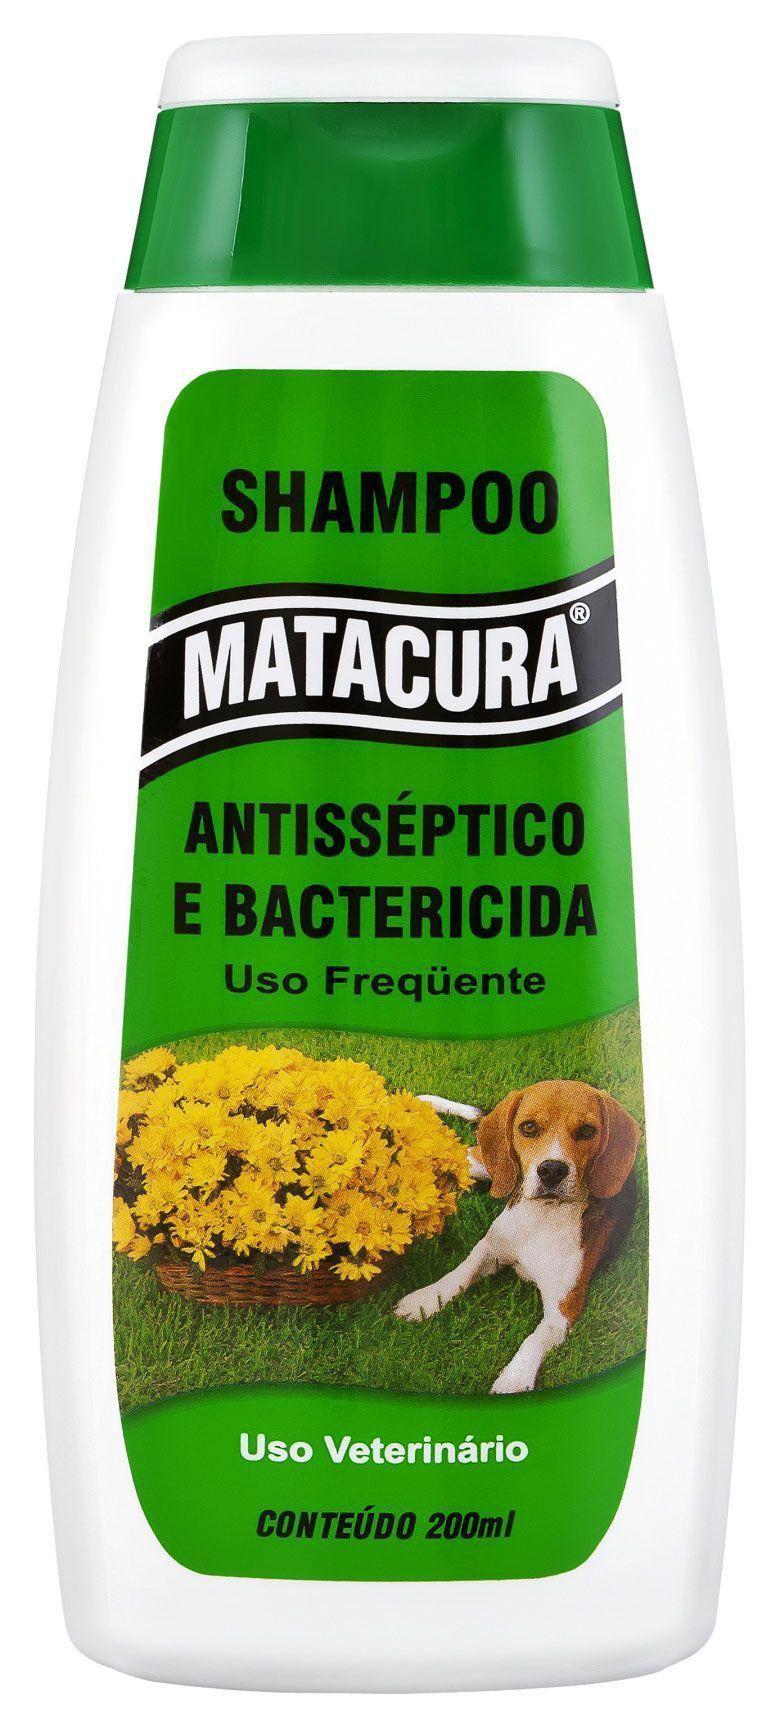 Shampoo Matacura Antisséptico e Bactericida - 200 mL